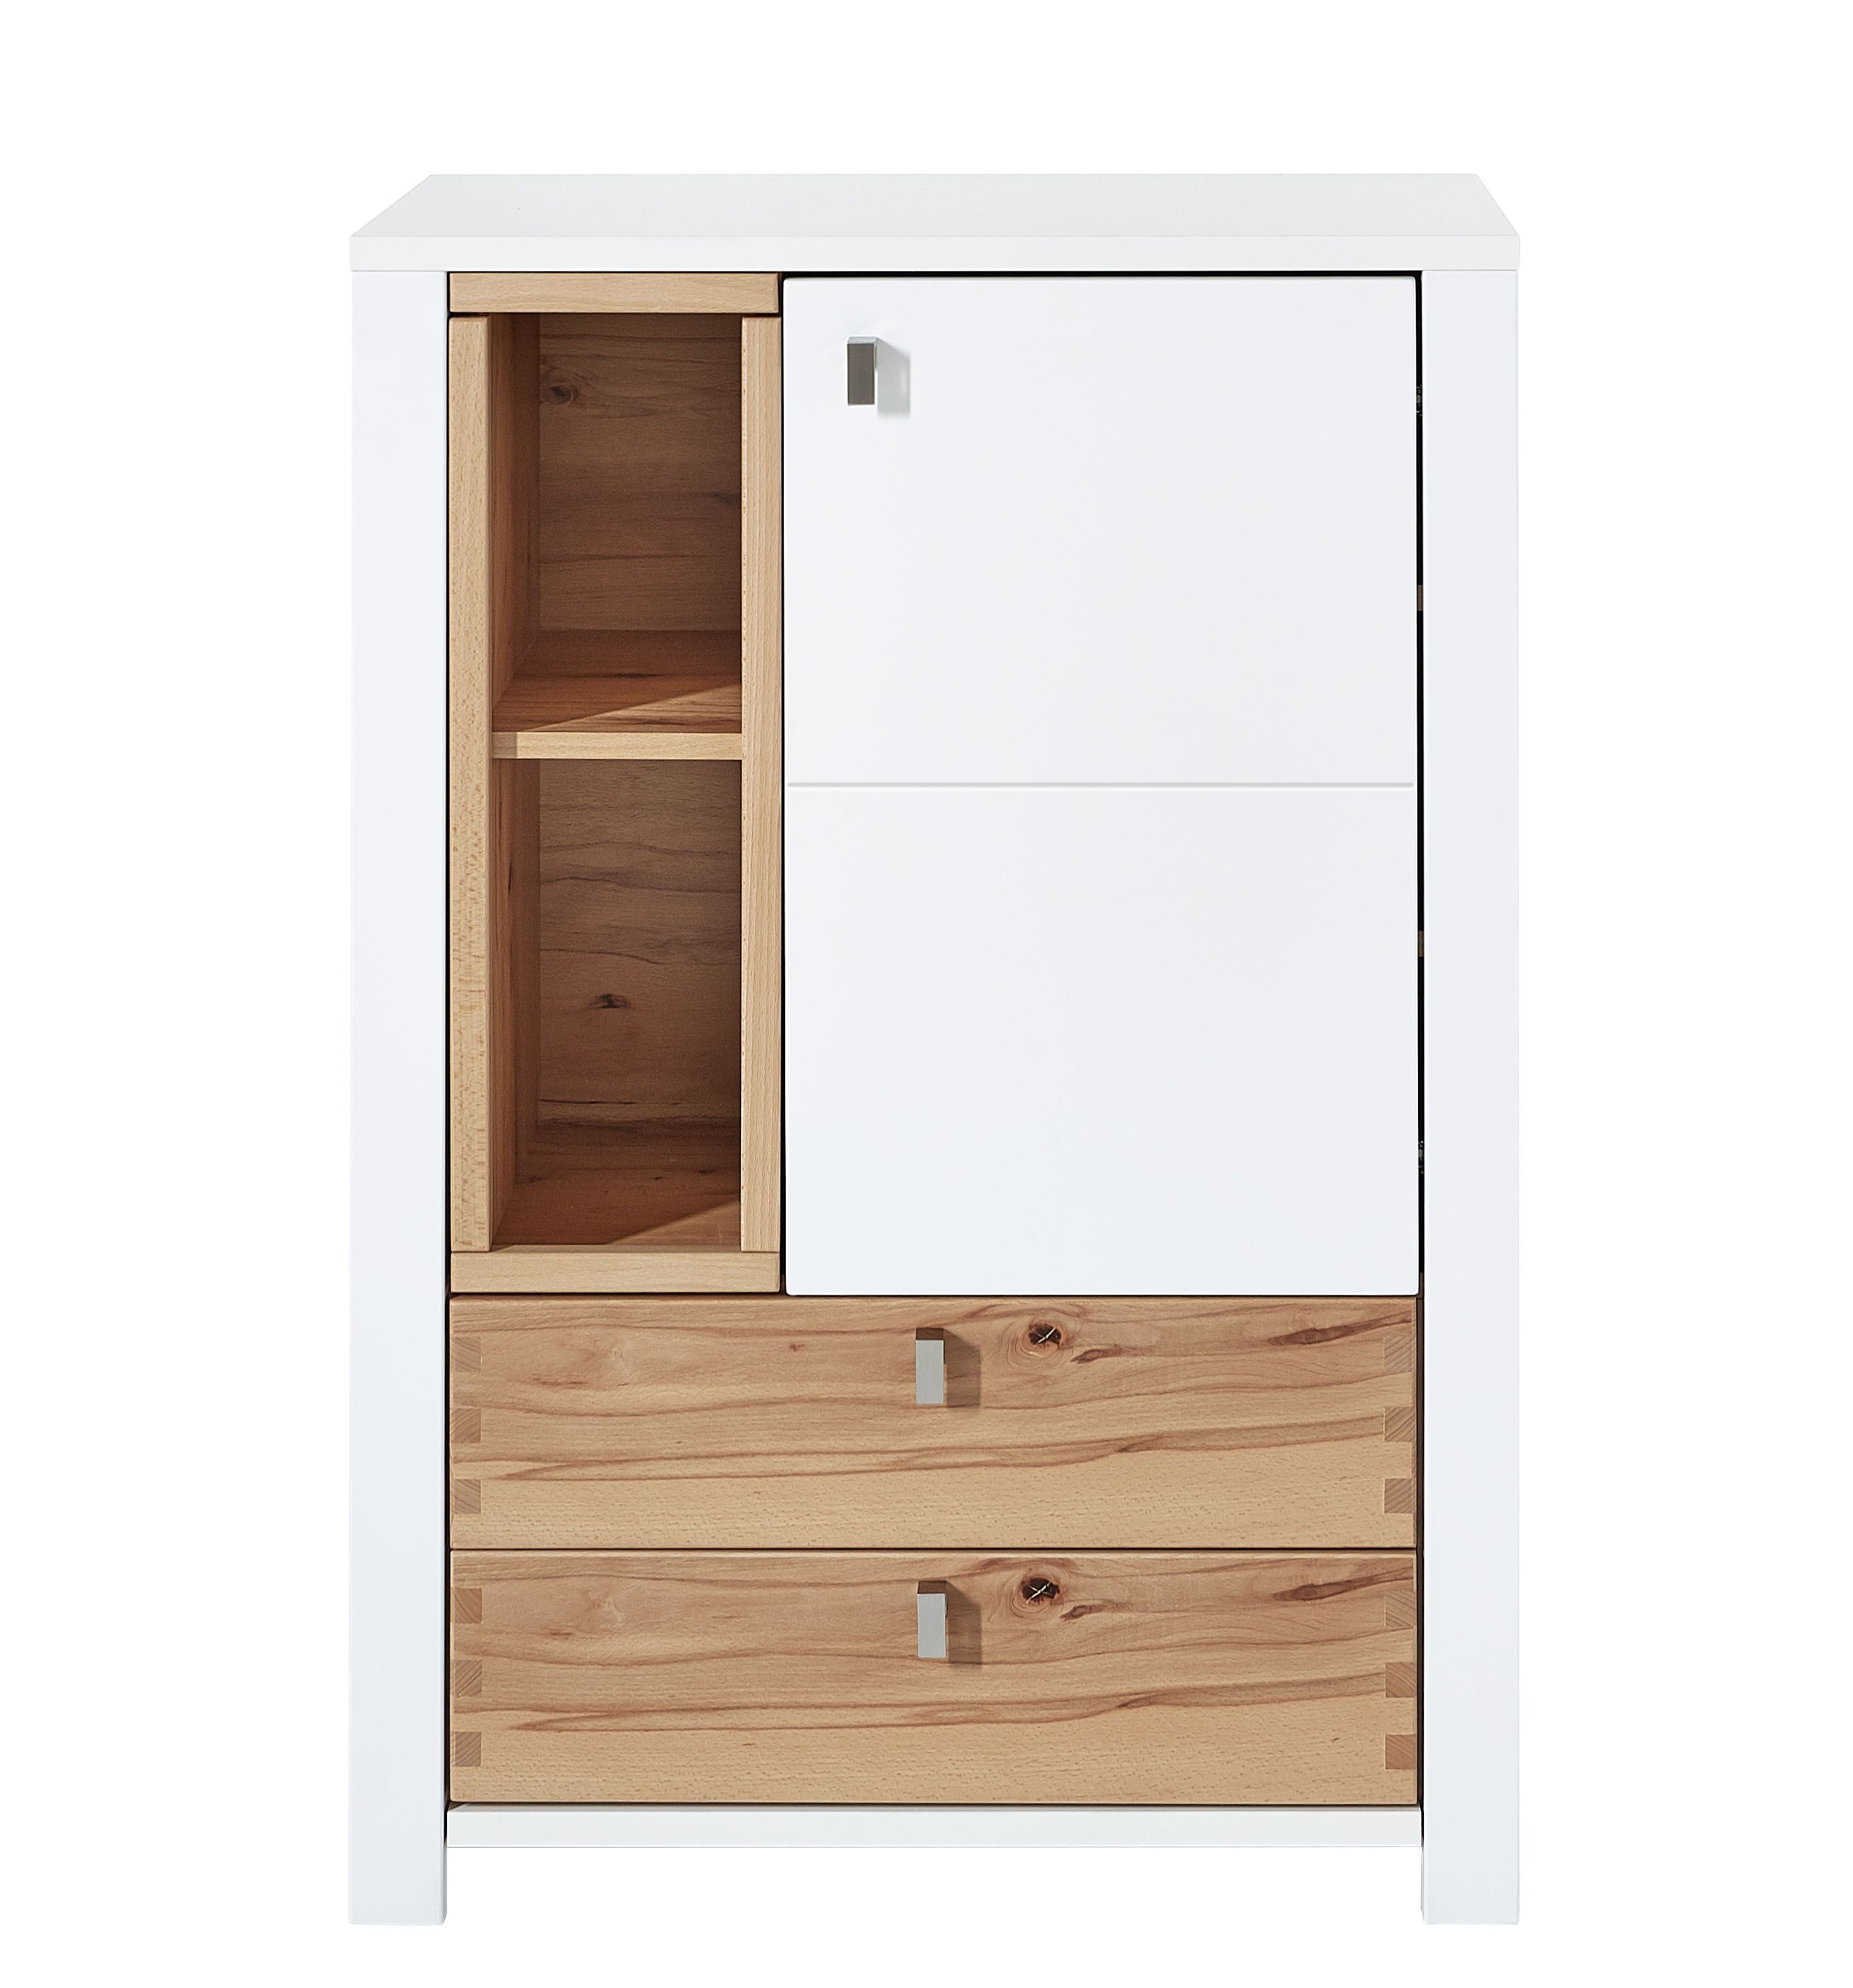 Cabinet din pal si MDF cu 2 sertare si 1 usa, Selina Alb / Natur, l73xA41xH106 cm imagine